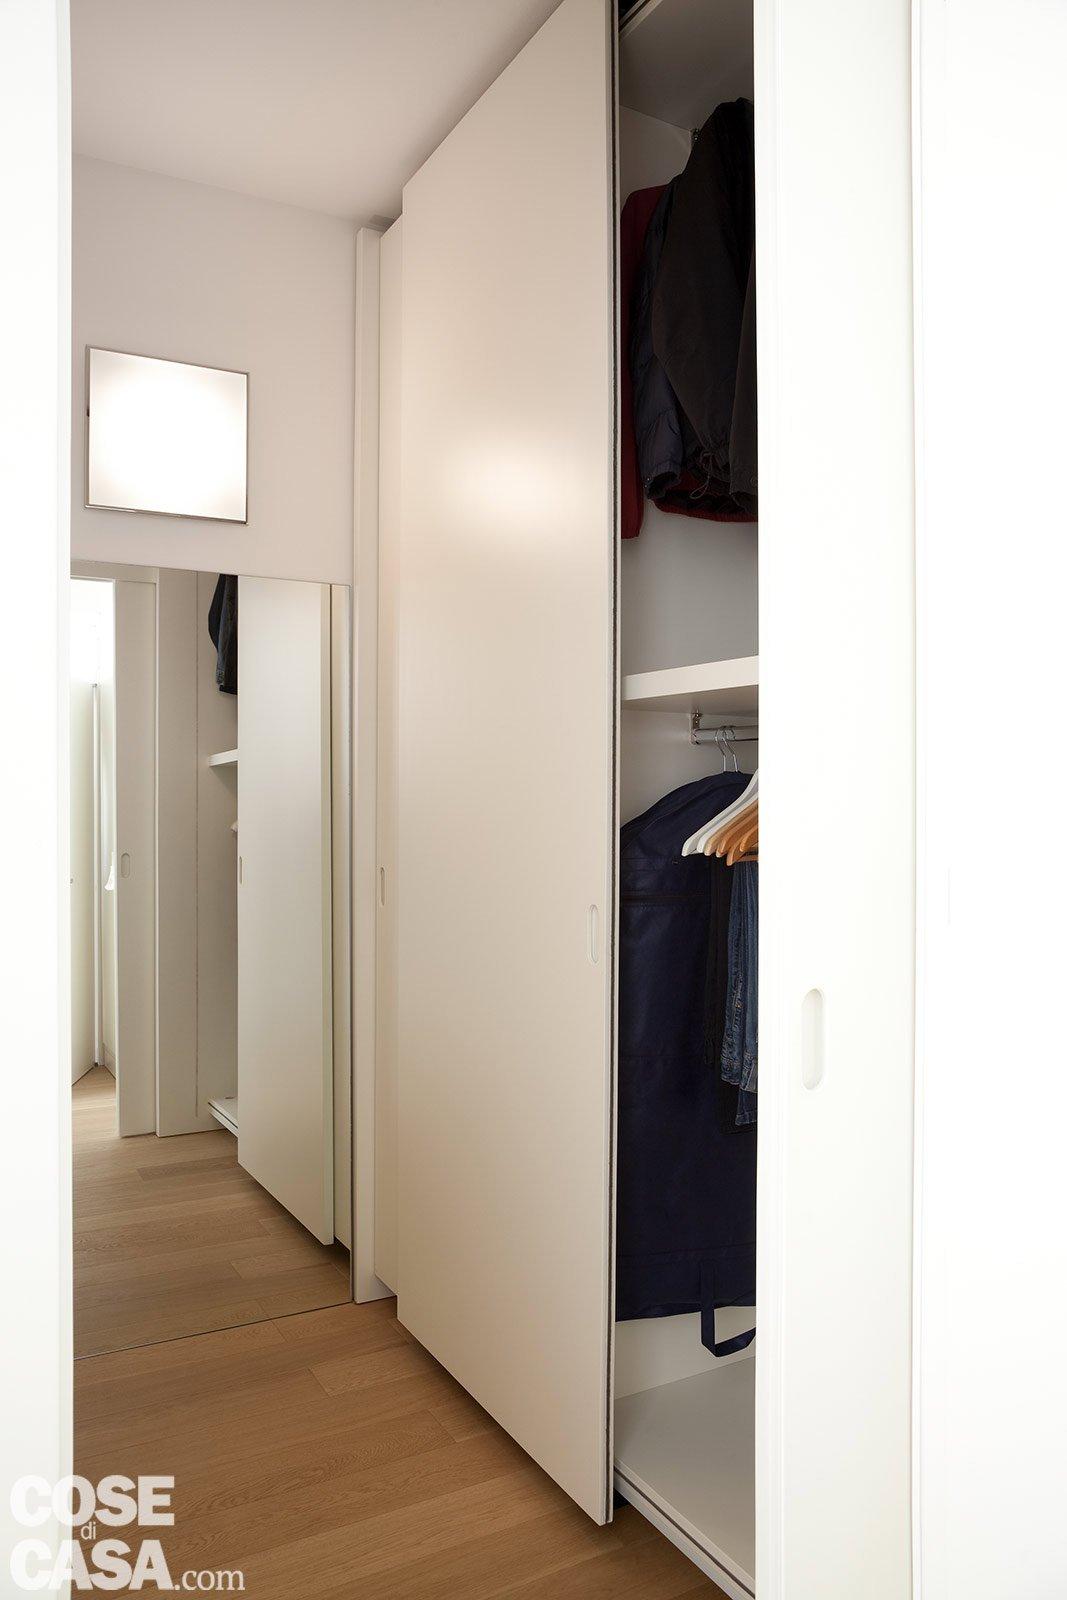 Armadio Ikea Ante Scorrevoli: Armadio ante scorrevoli specchio ...